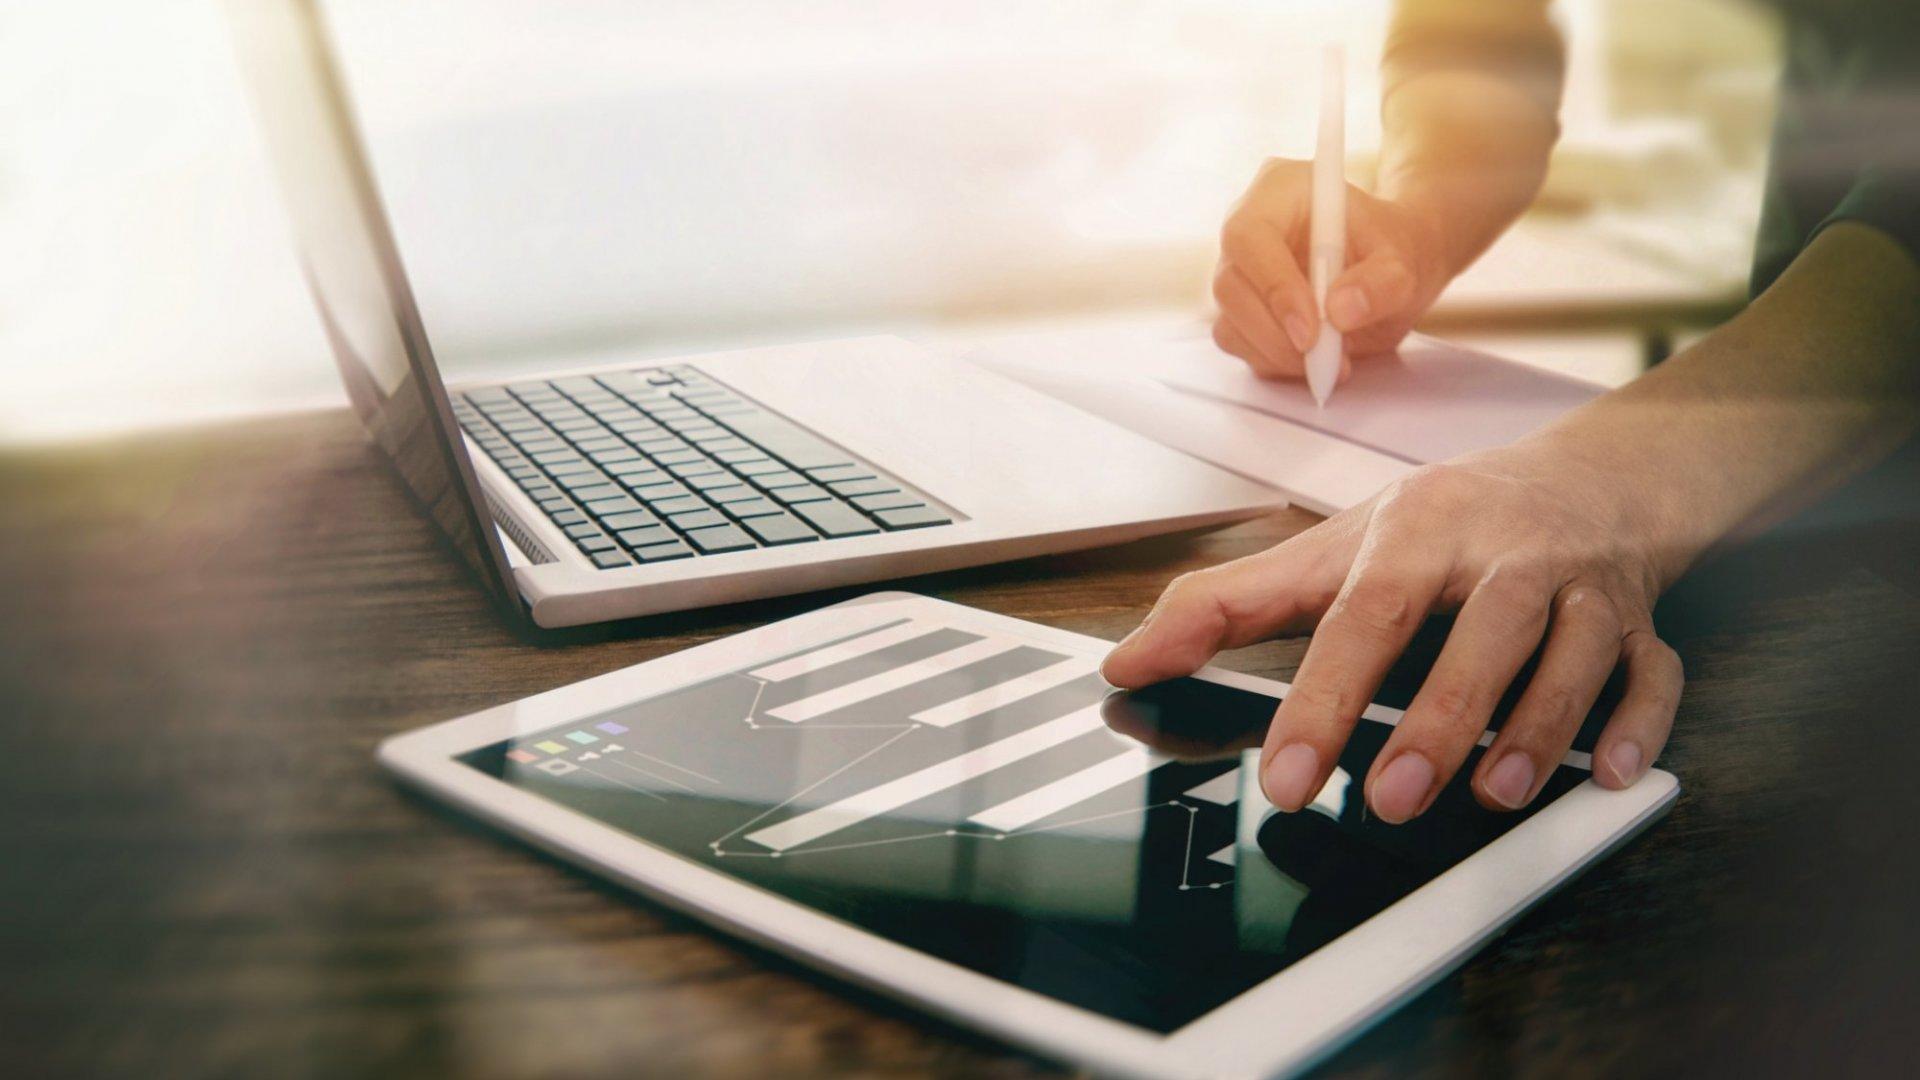 4 Marketing Goals Every Entrepreneur Should Have in 2019